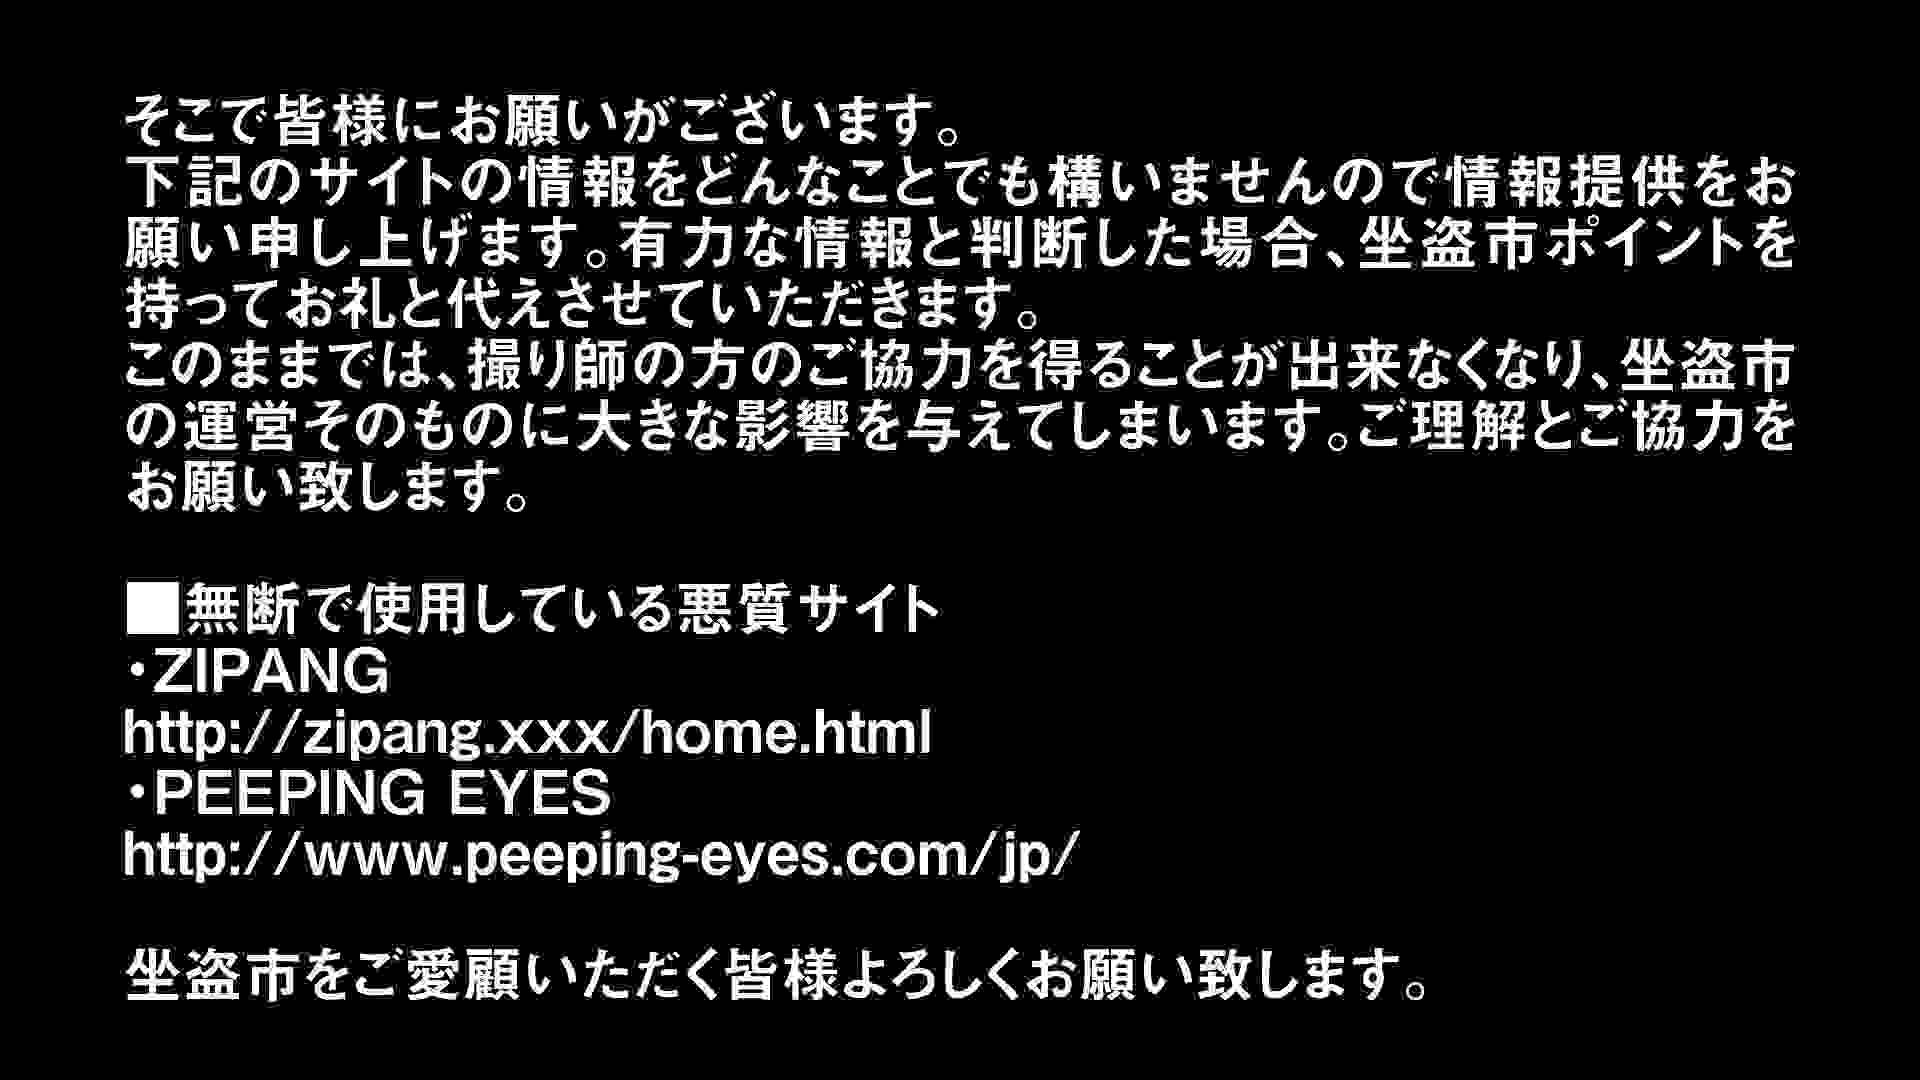 Aquaな露天風呂Vol.301 盗撮  112連発 39